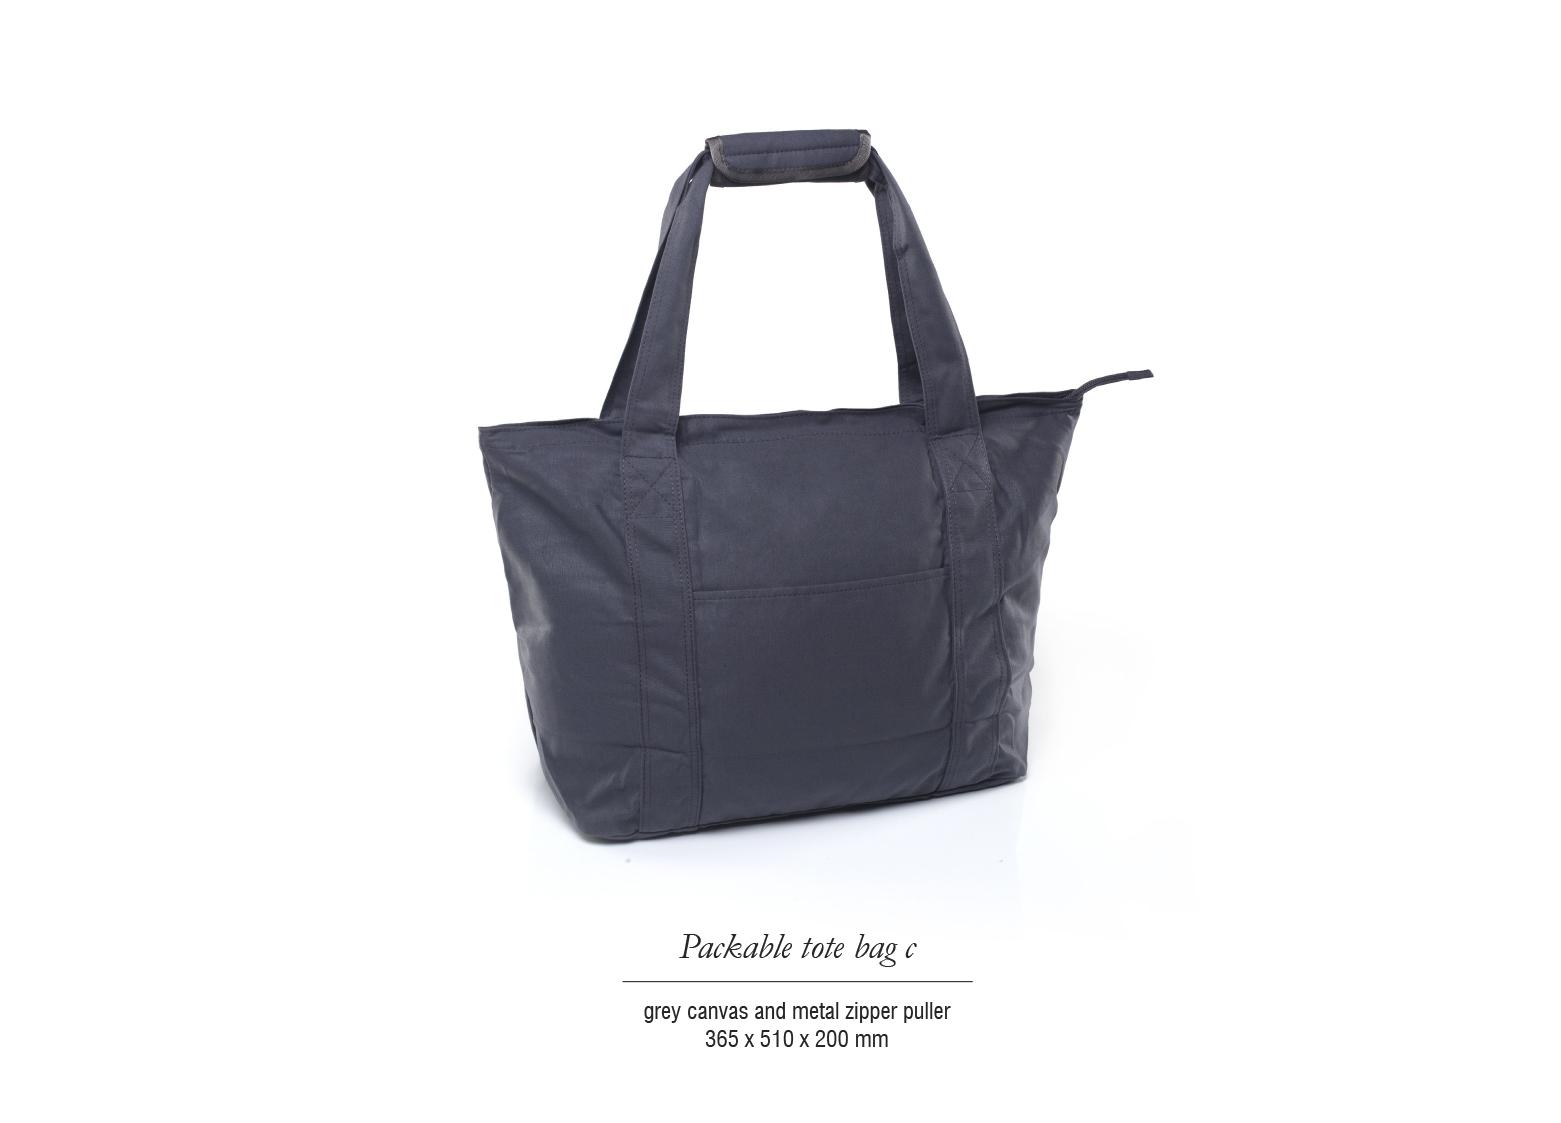 Amenity bags catalogue 2016_SHcollection_V6 96.jpg